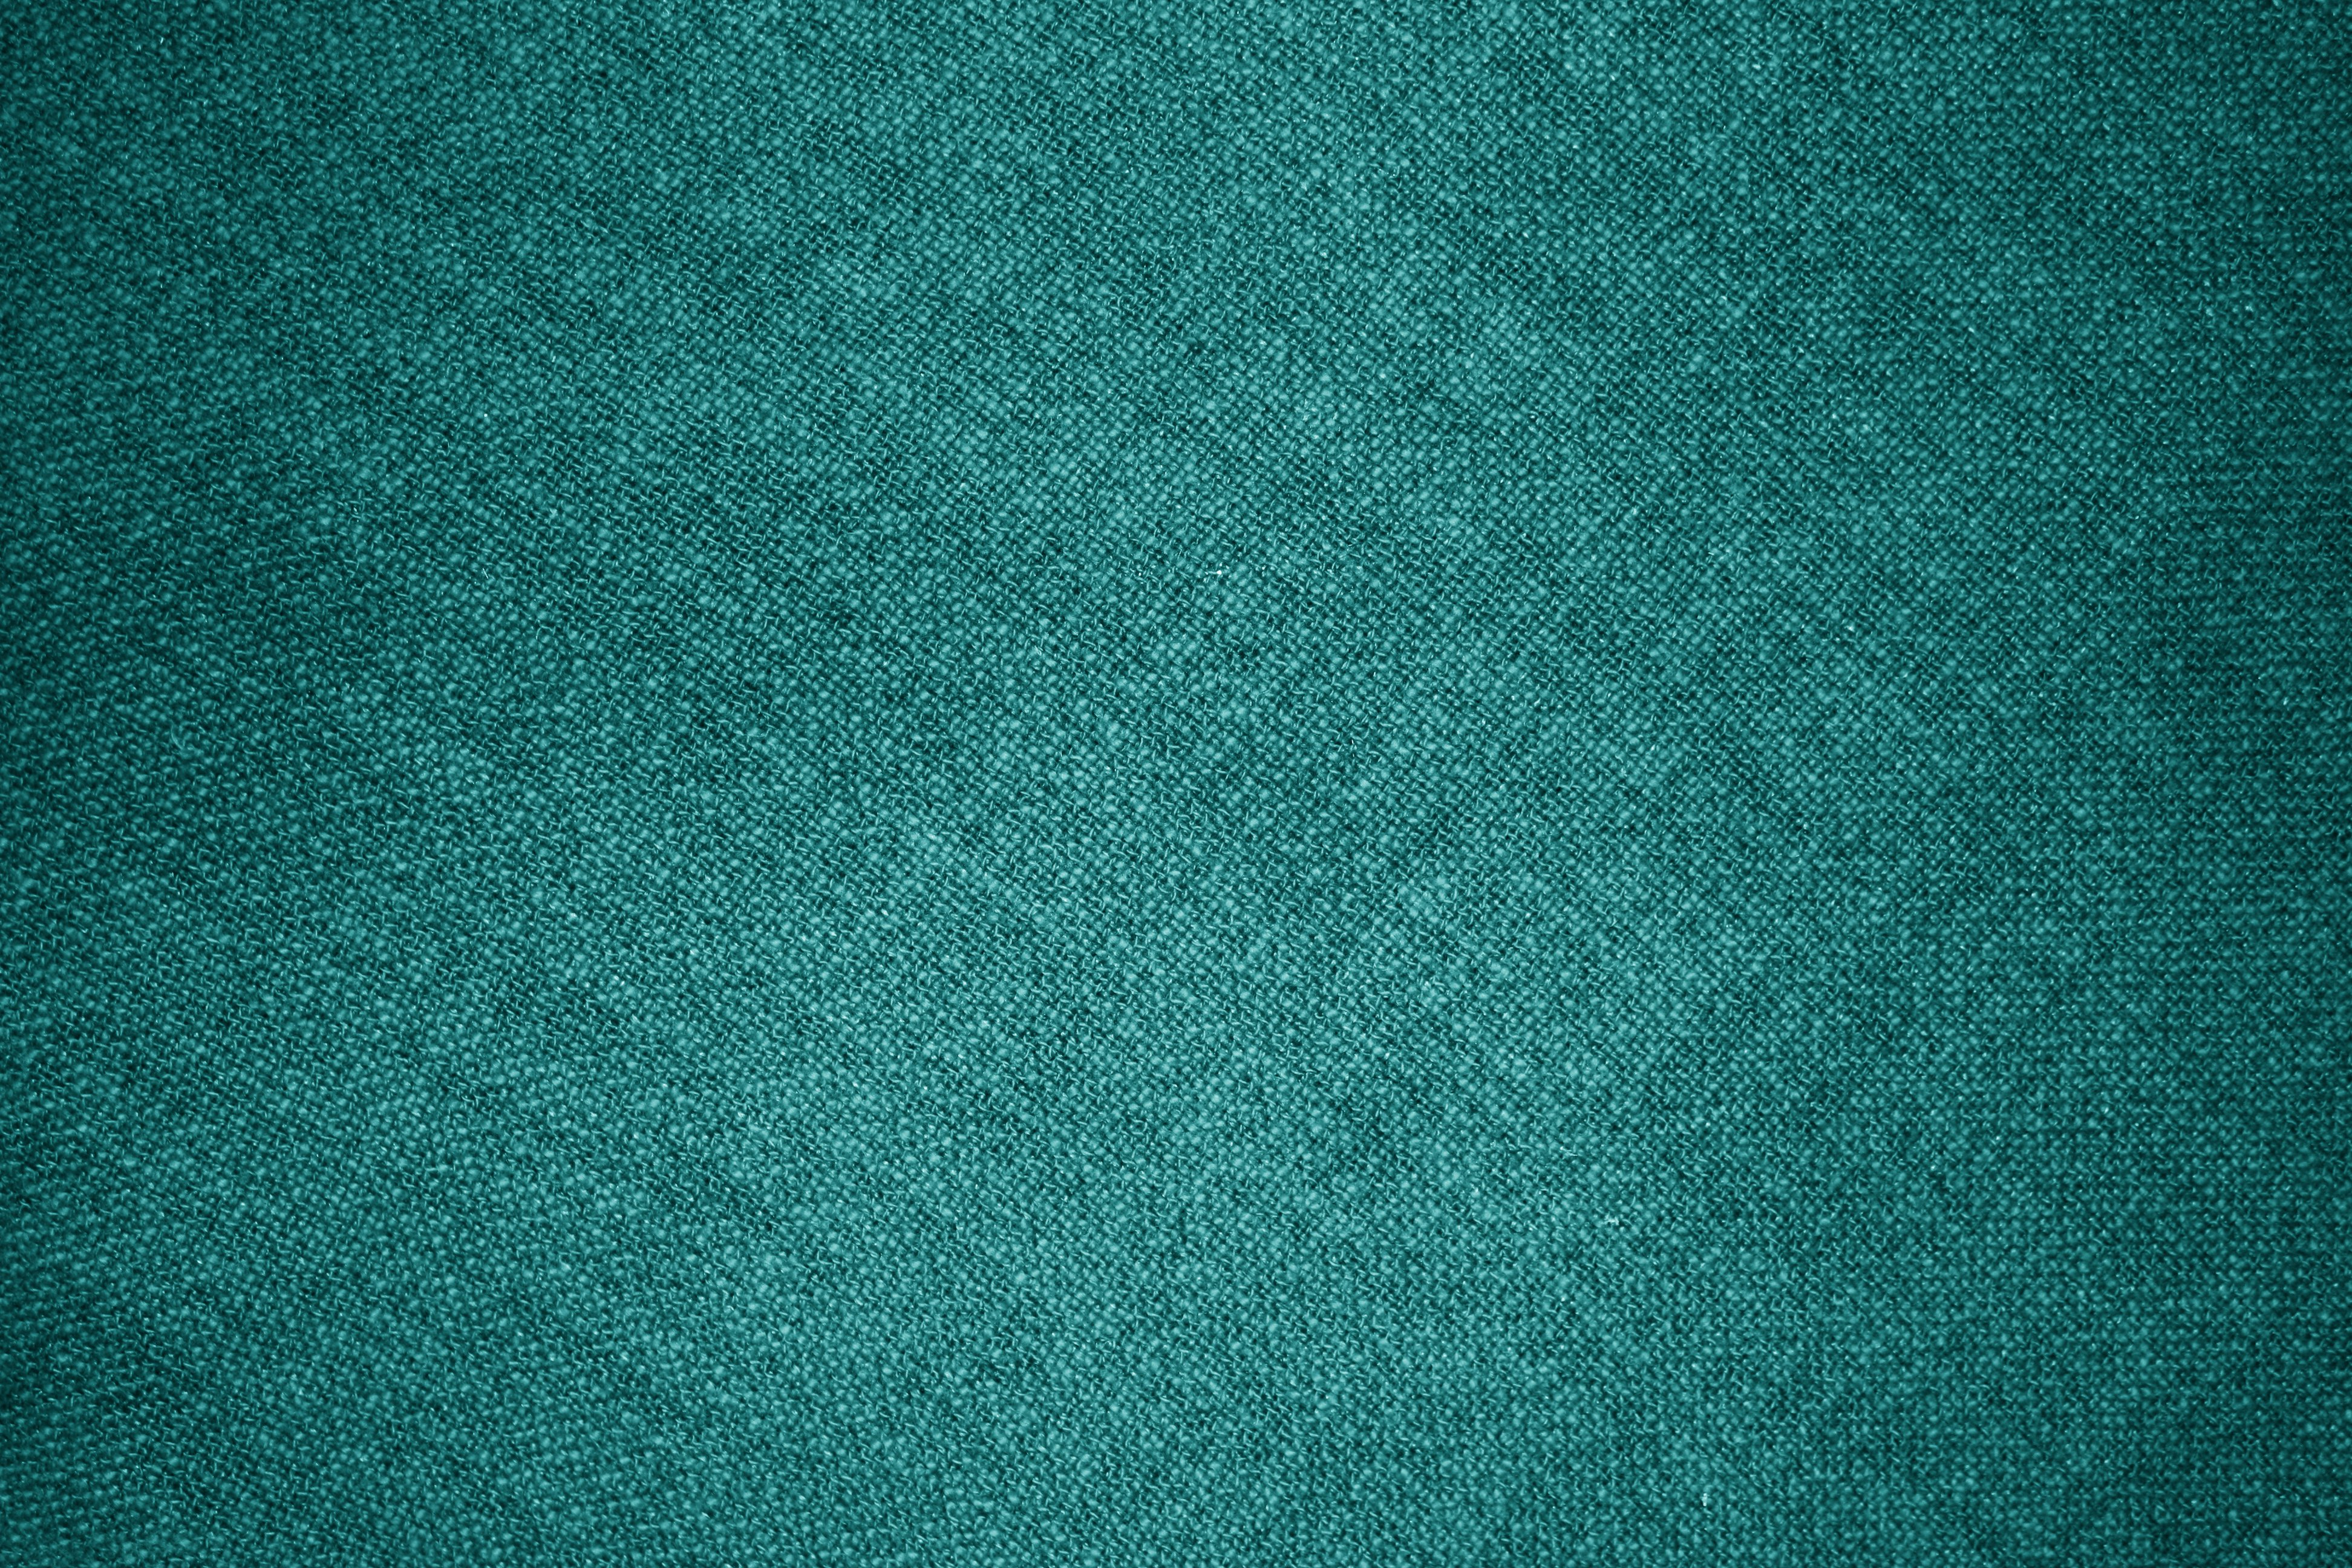 teal vintage texture wide wallpaper 27843